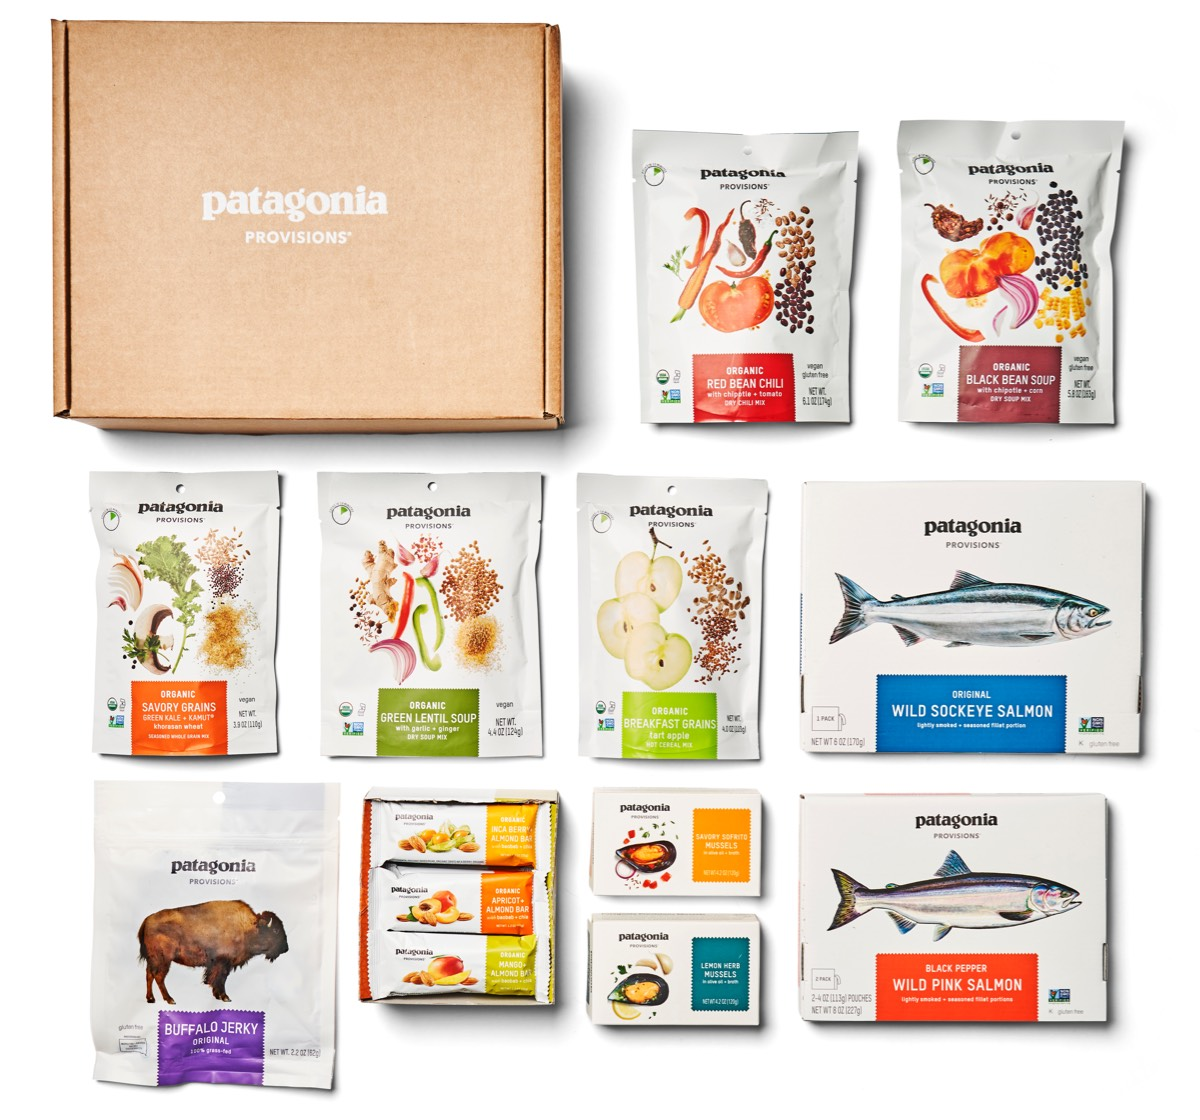 pantry stuffer gift box Image